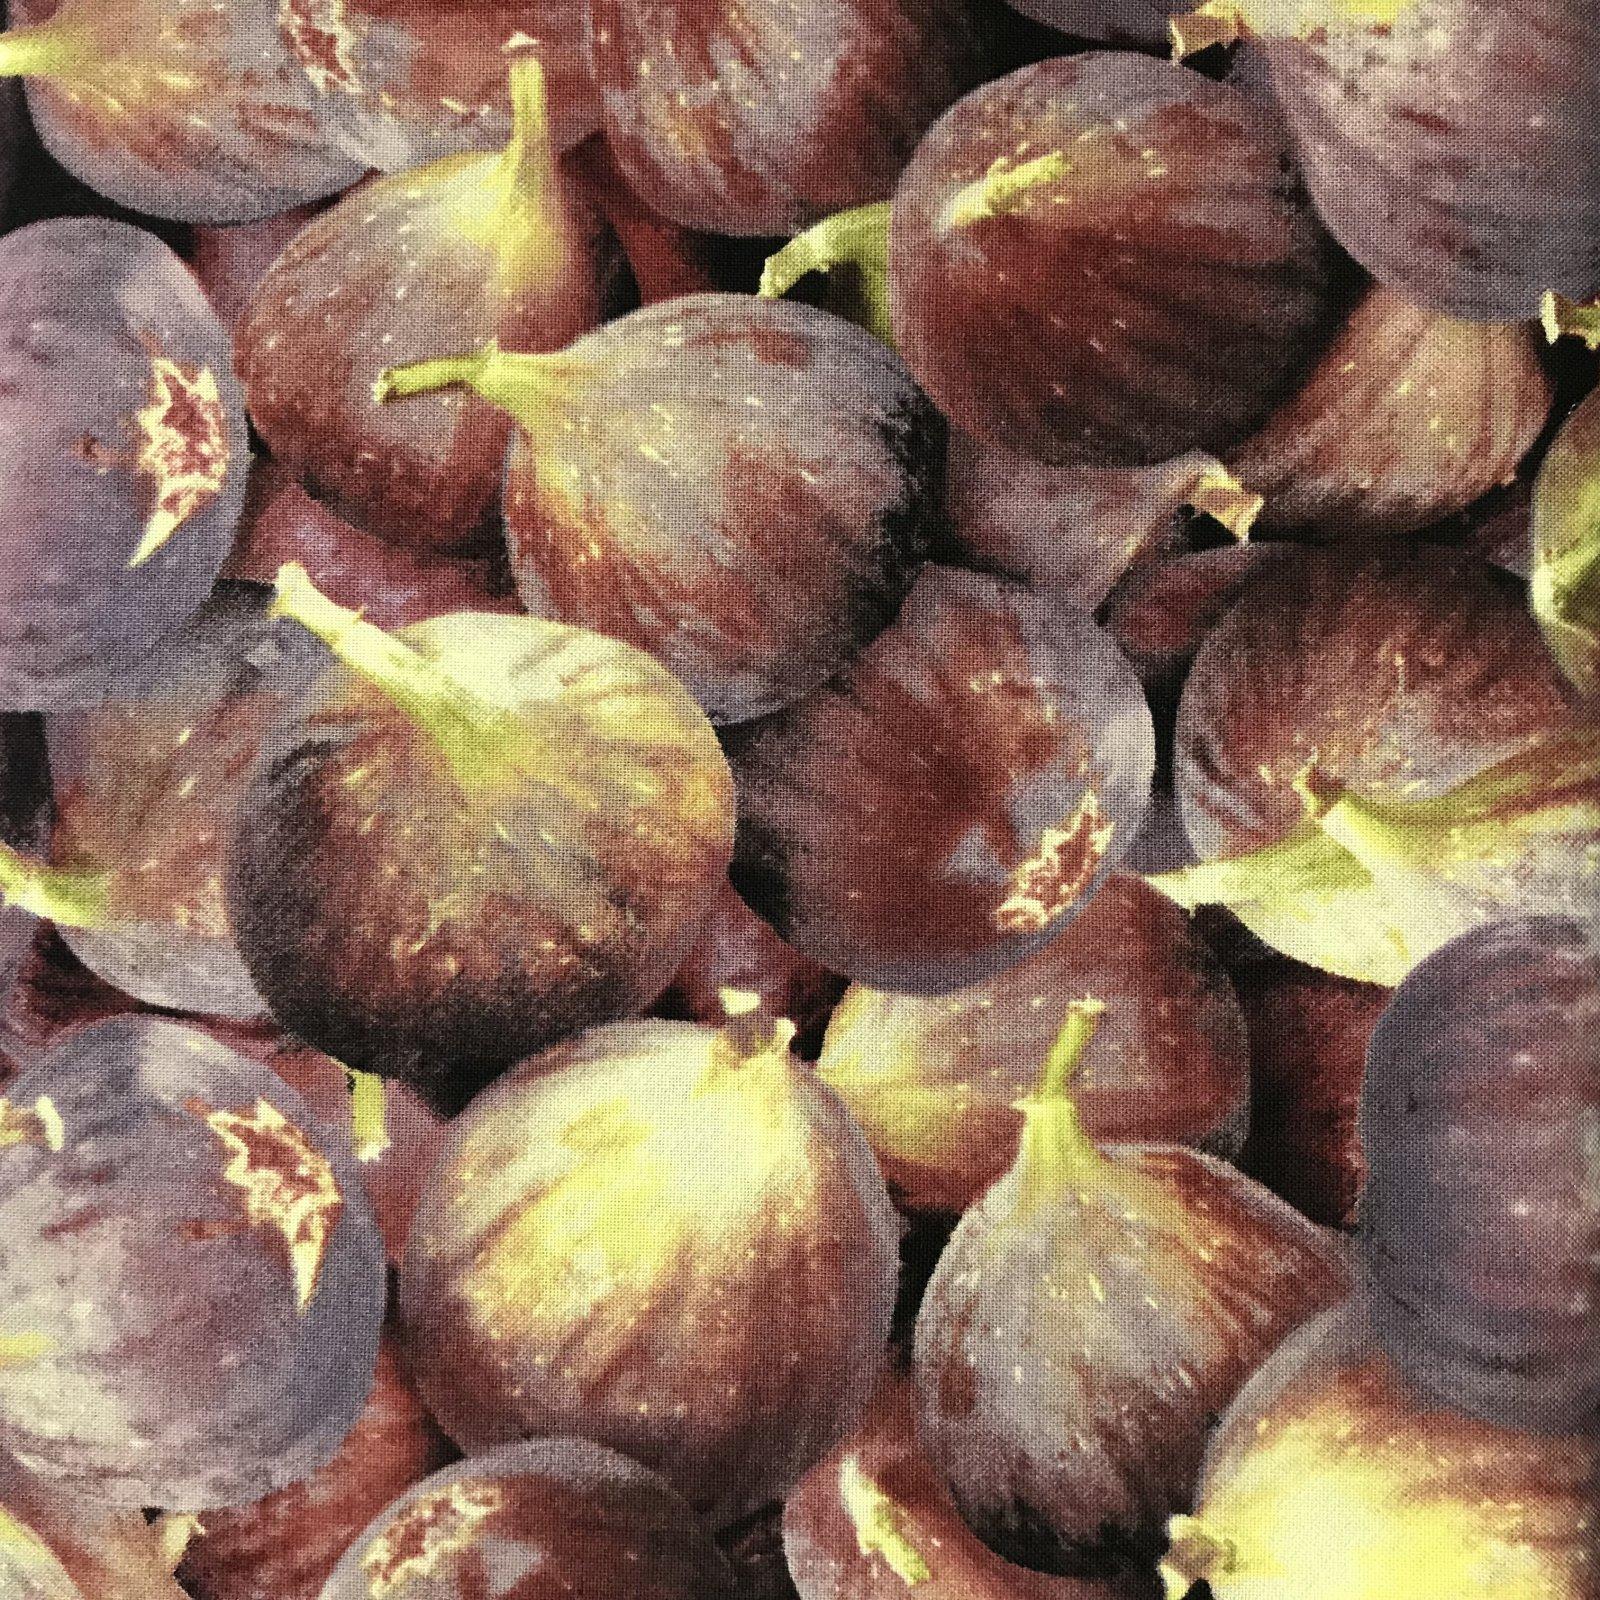 Farmers Markets Figs by RJR Fabrics 8880 PLUM